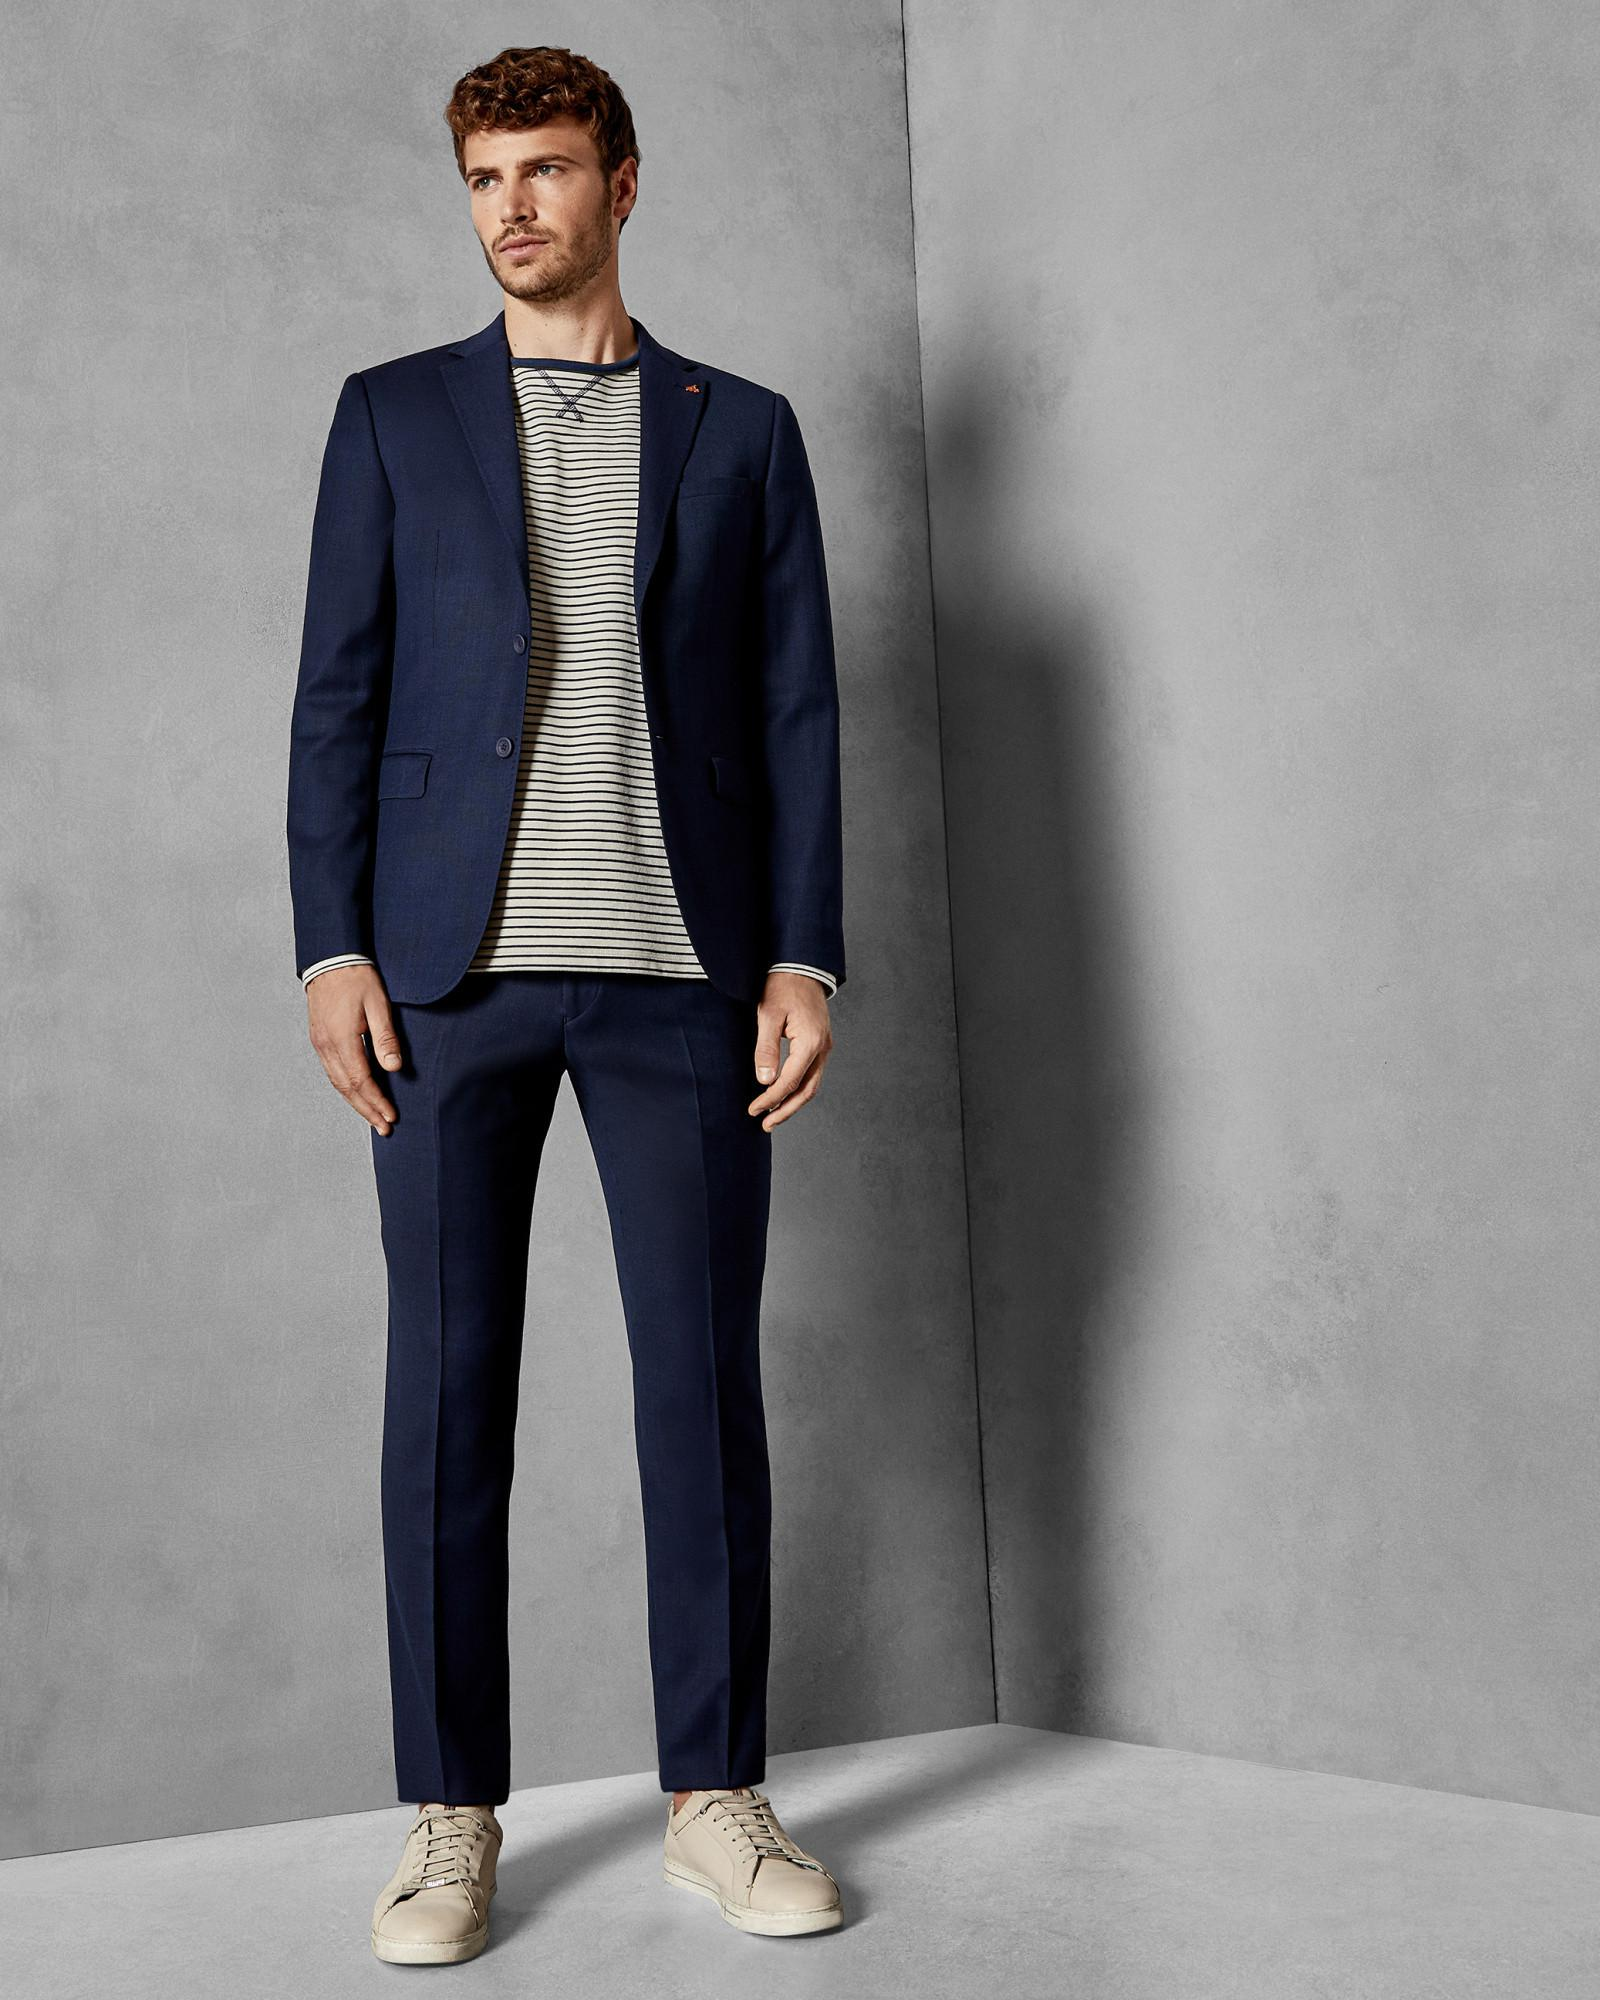 6562f043d574 Lyst - Ted Baker Endurance Birdseye Wool Performance Suit Jacket in Blue  for Men